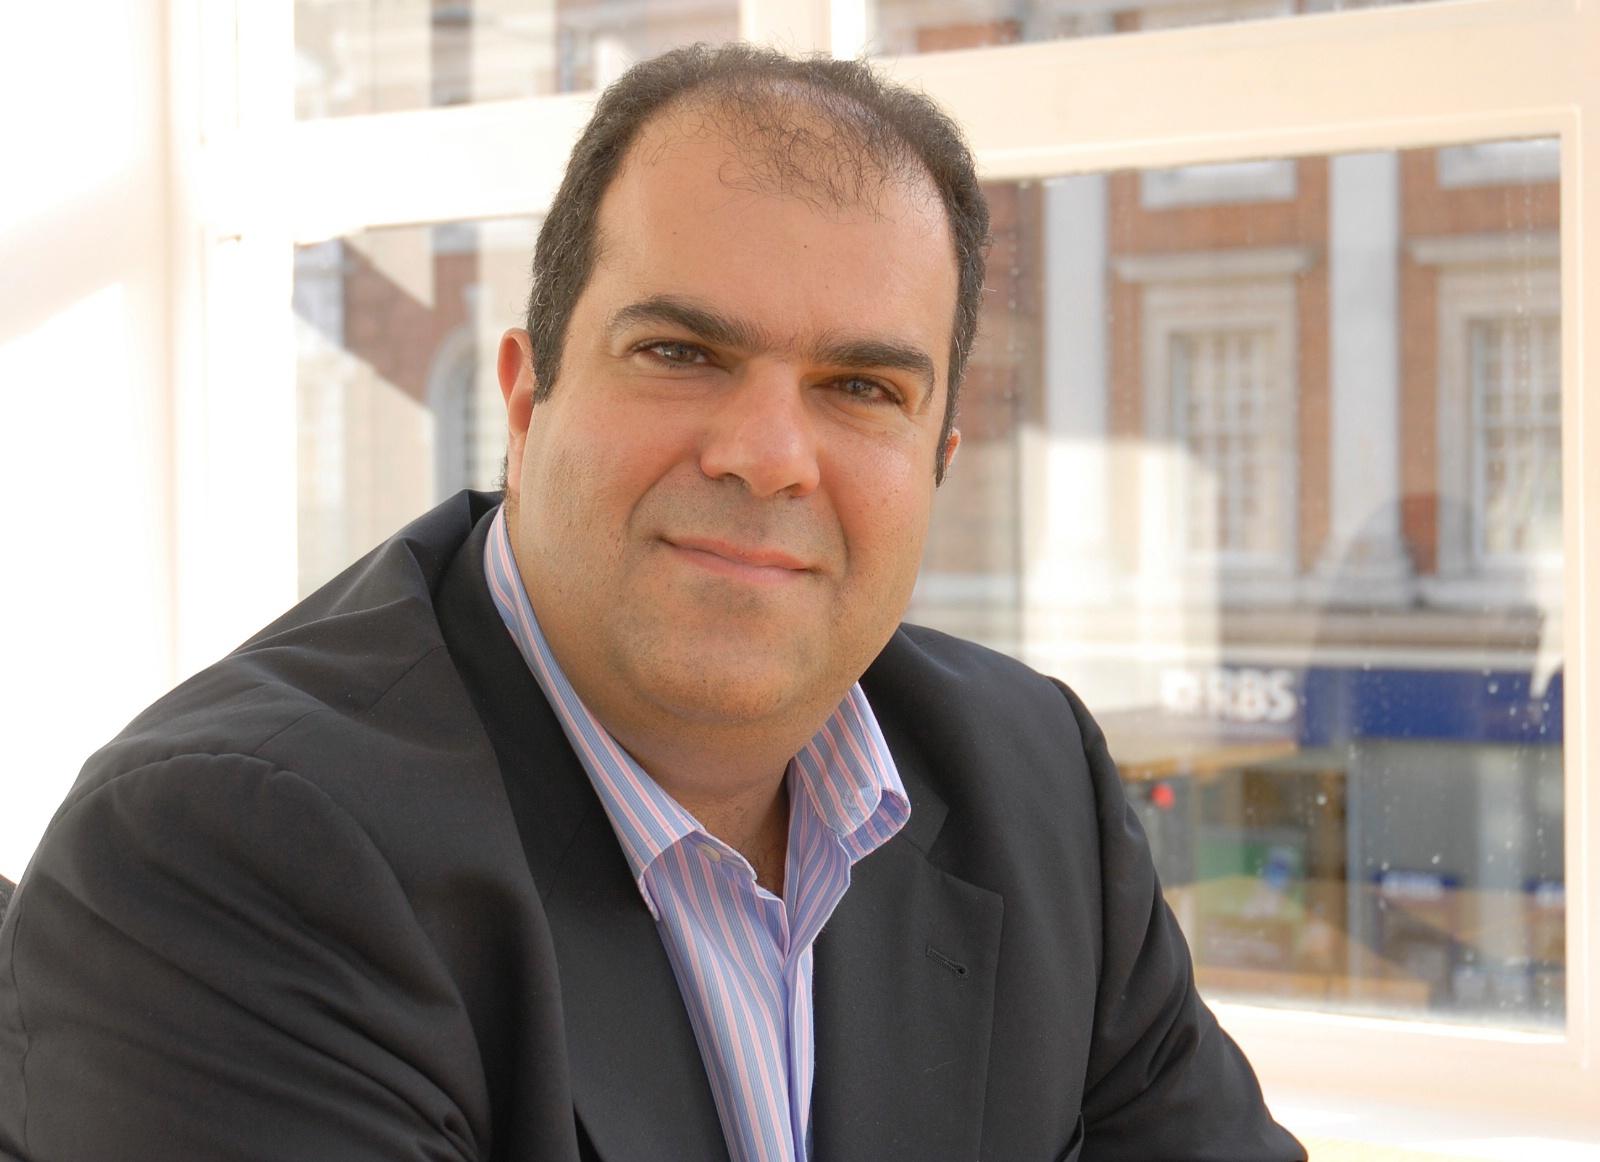 Sir Stelios Haji-Ioannou grundlagde som 28-årig easyJet i 1995 (Foto: easy.com | PR)